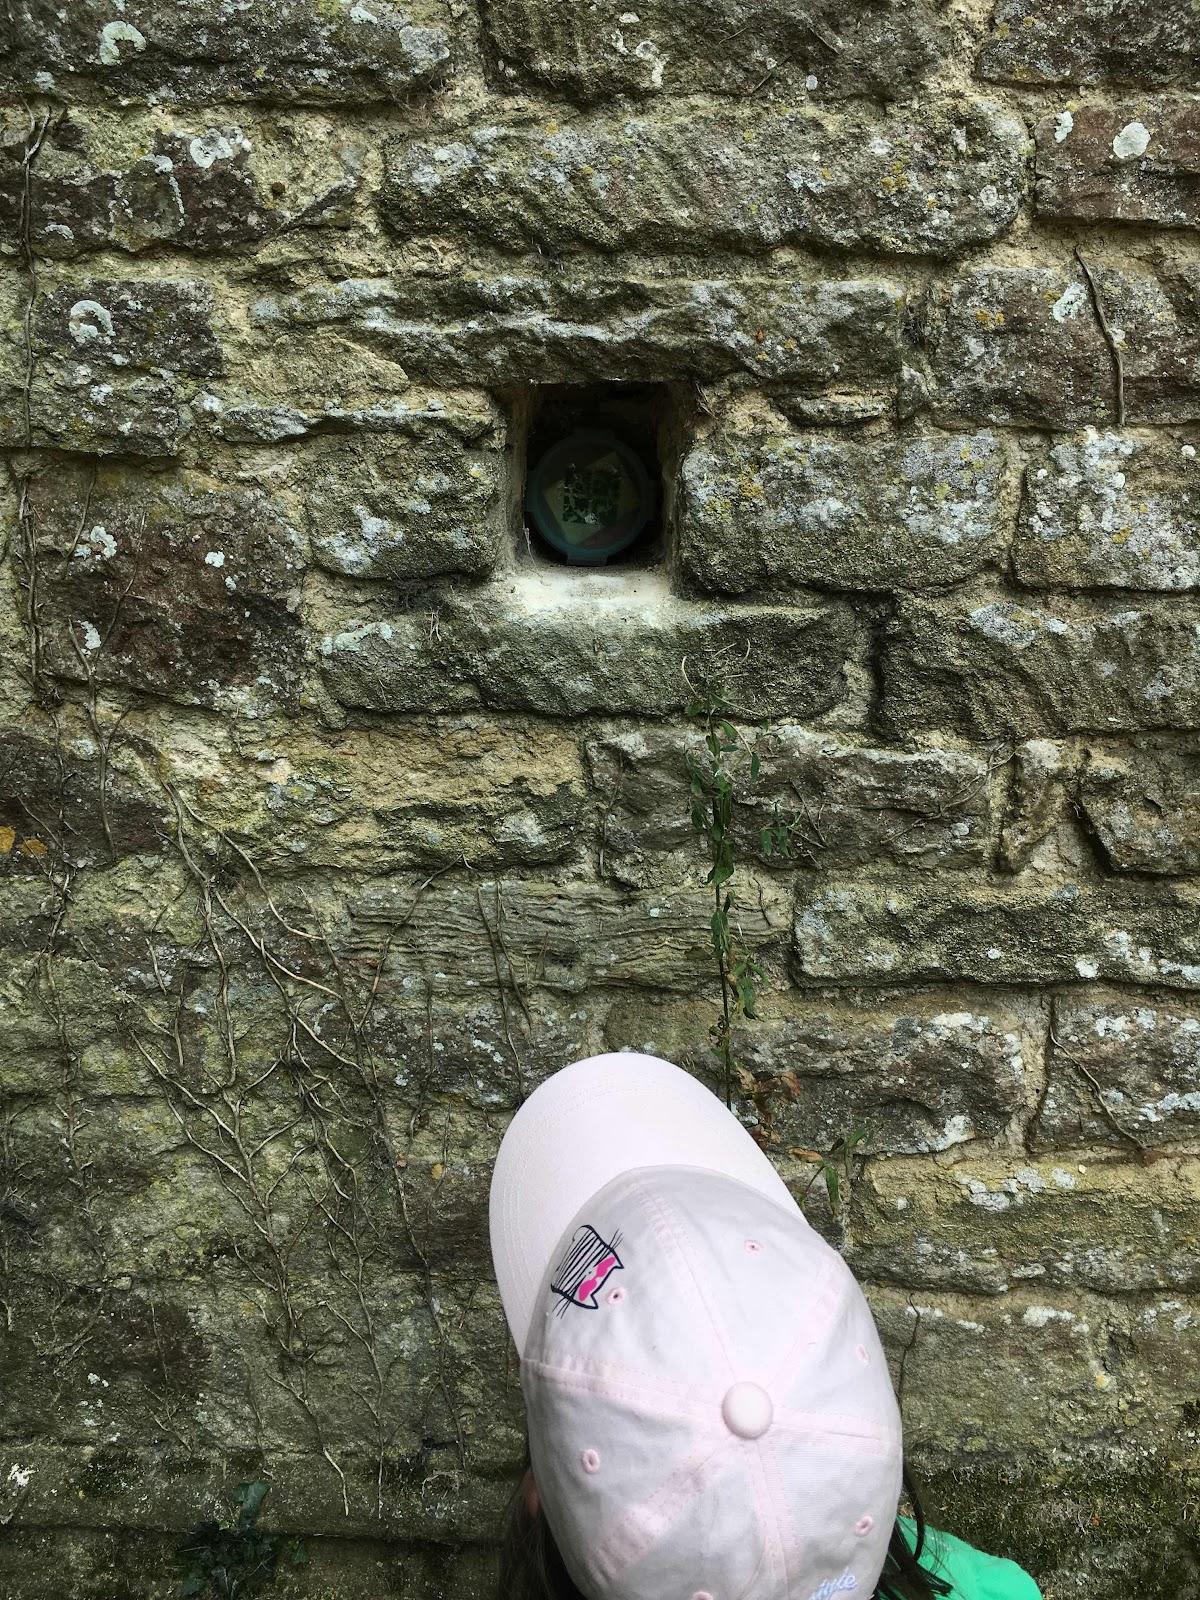 Small geocache hidden in a wall